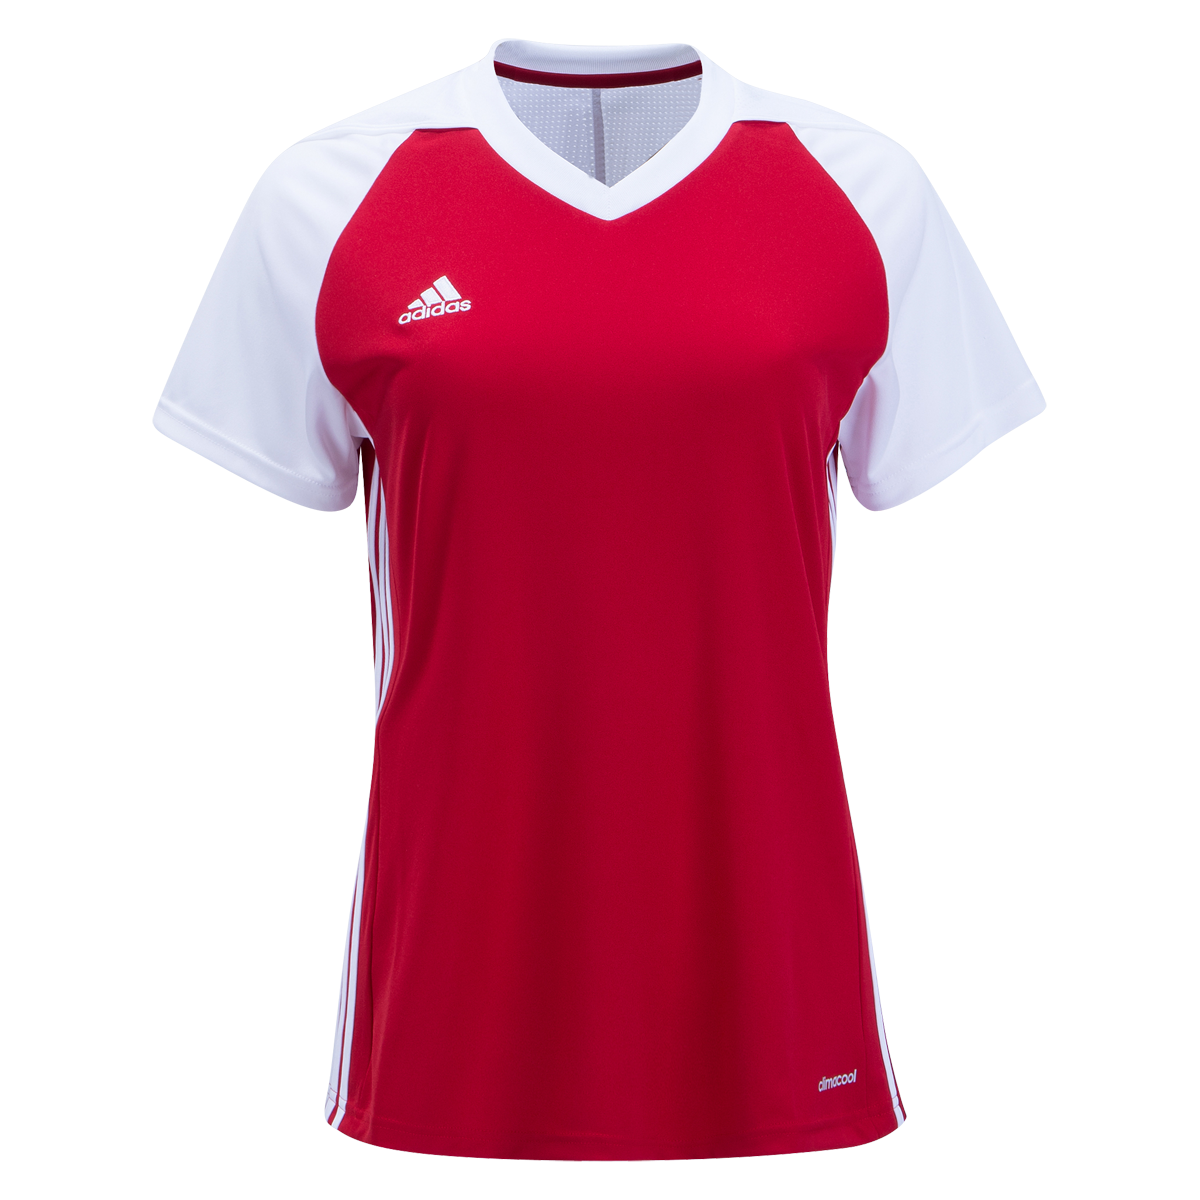 adidas Women's Ajax Joga mi Tiro 17 Home Jersey-custom-xs | Adidas ...